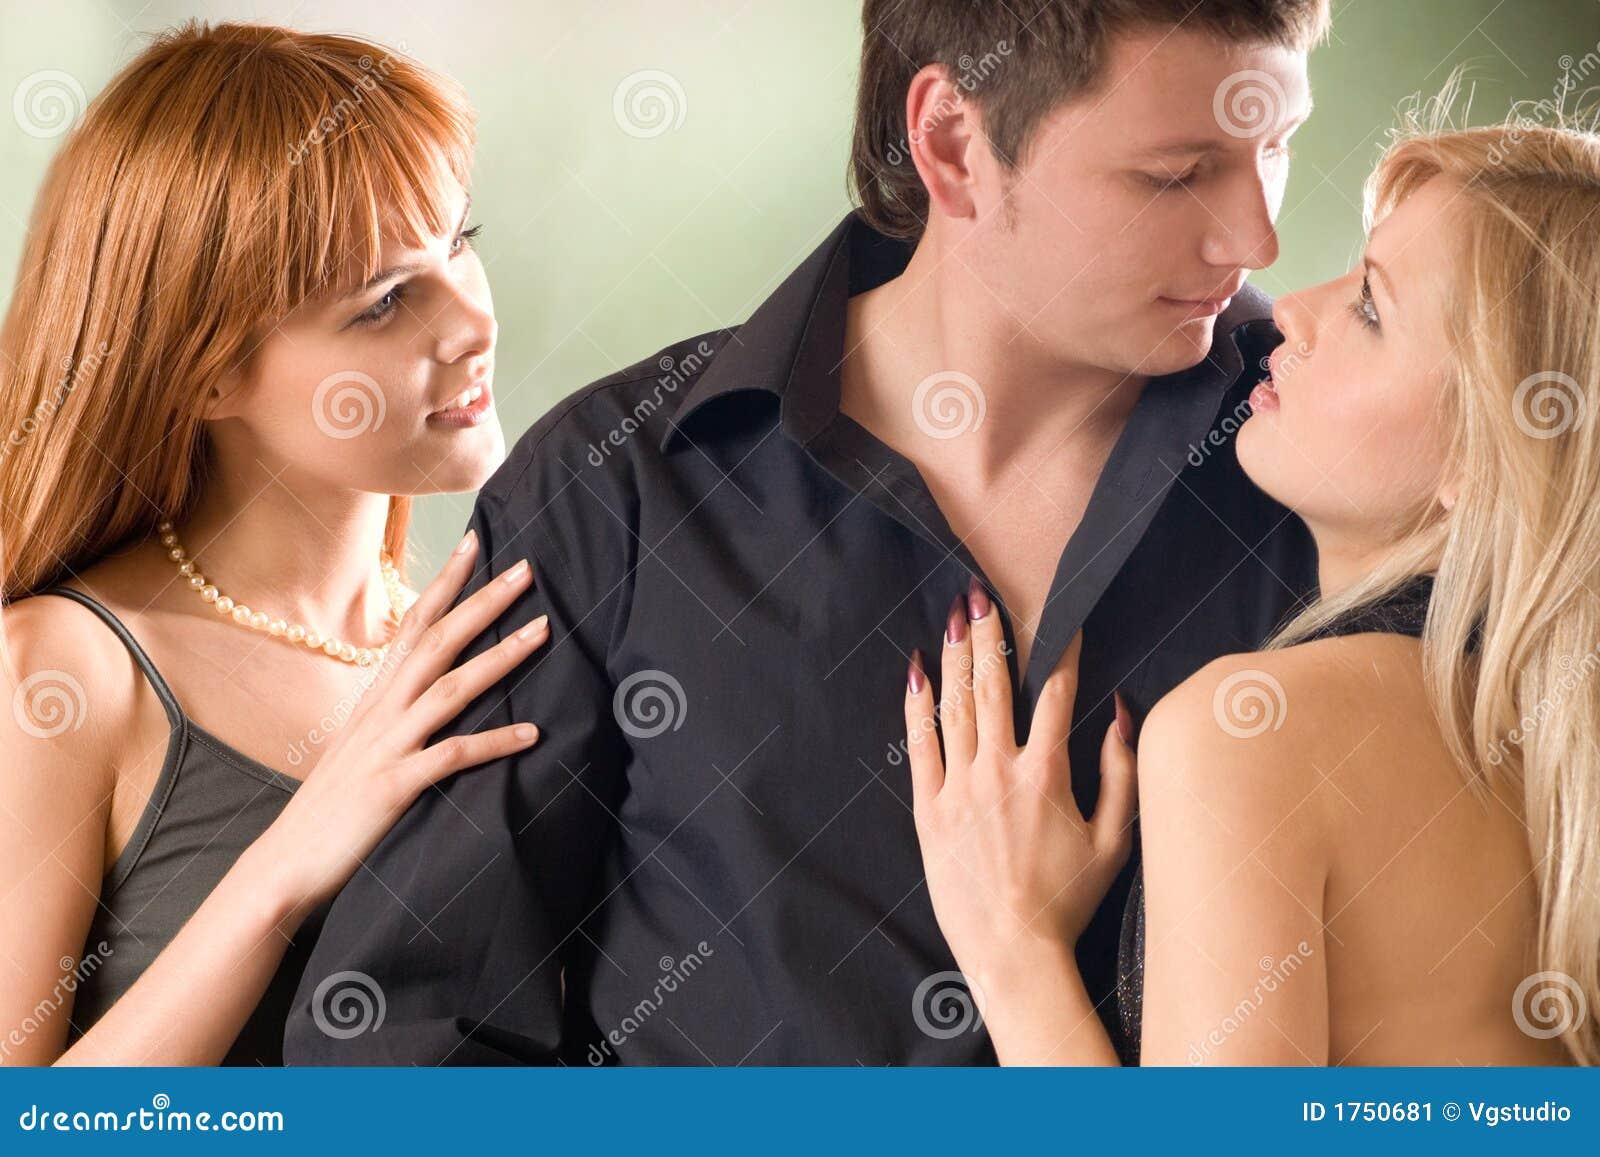 Dos chicas jóvenes azotando a hombre